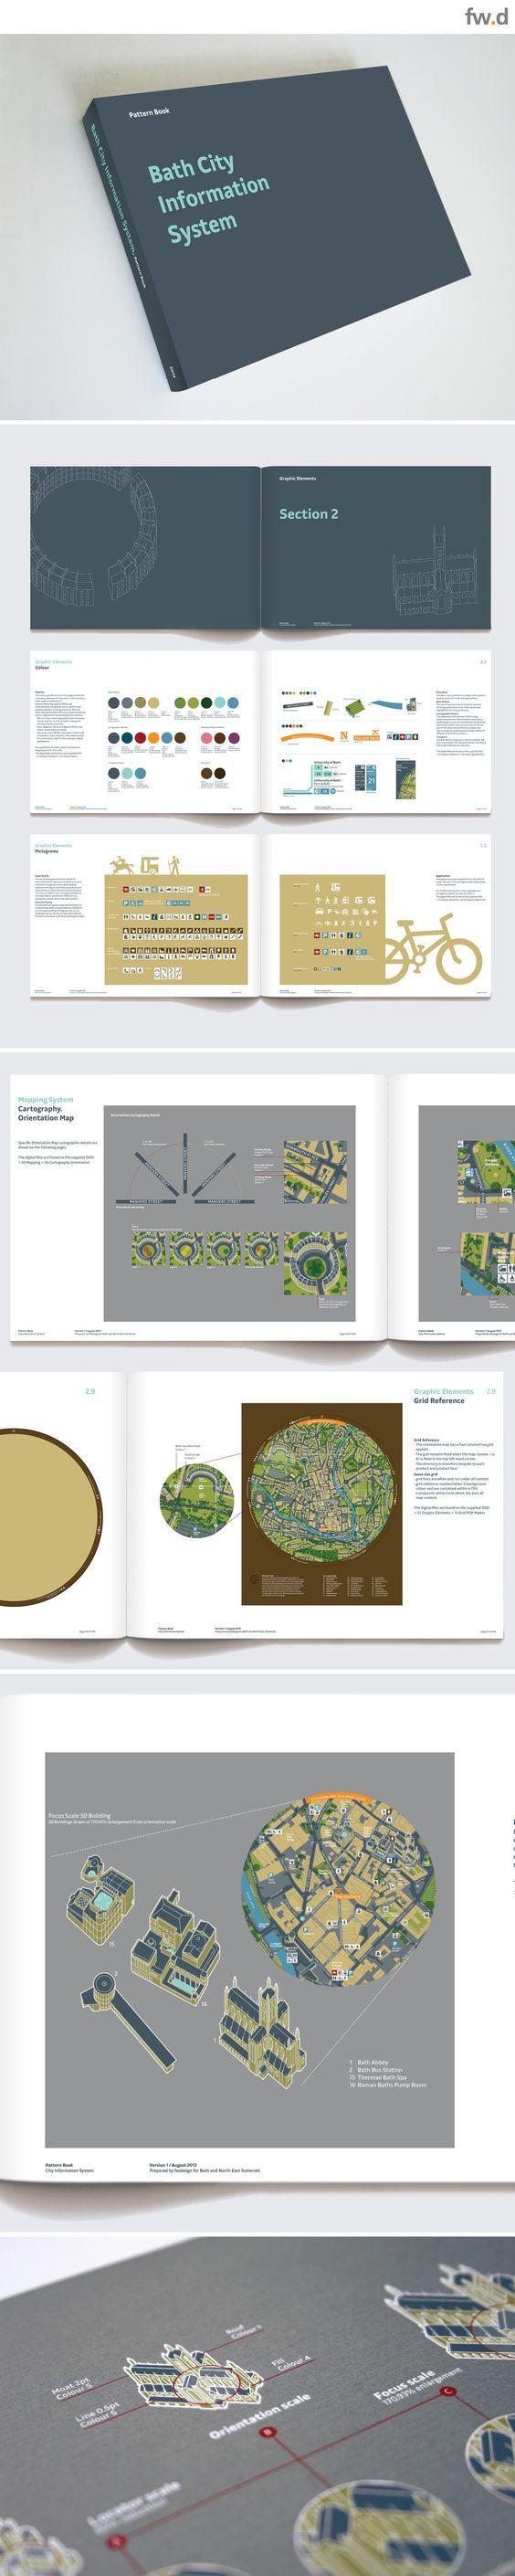 Bath City Information System pattern book. Detailed pedestrian wayfinding & signage design guidelines by fwdesign. www.fwdesign.com  #guidelines #layout #graphics: